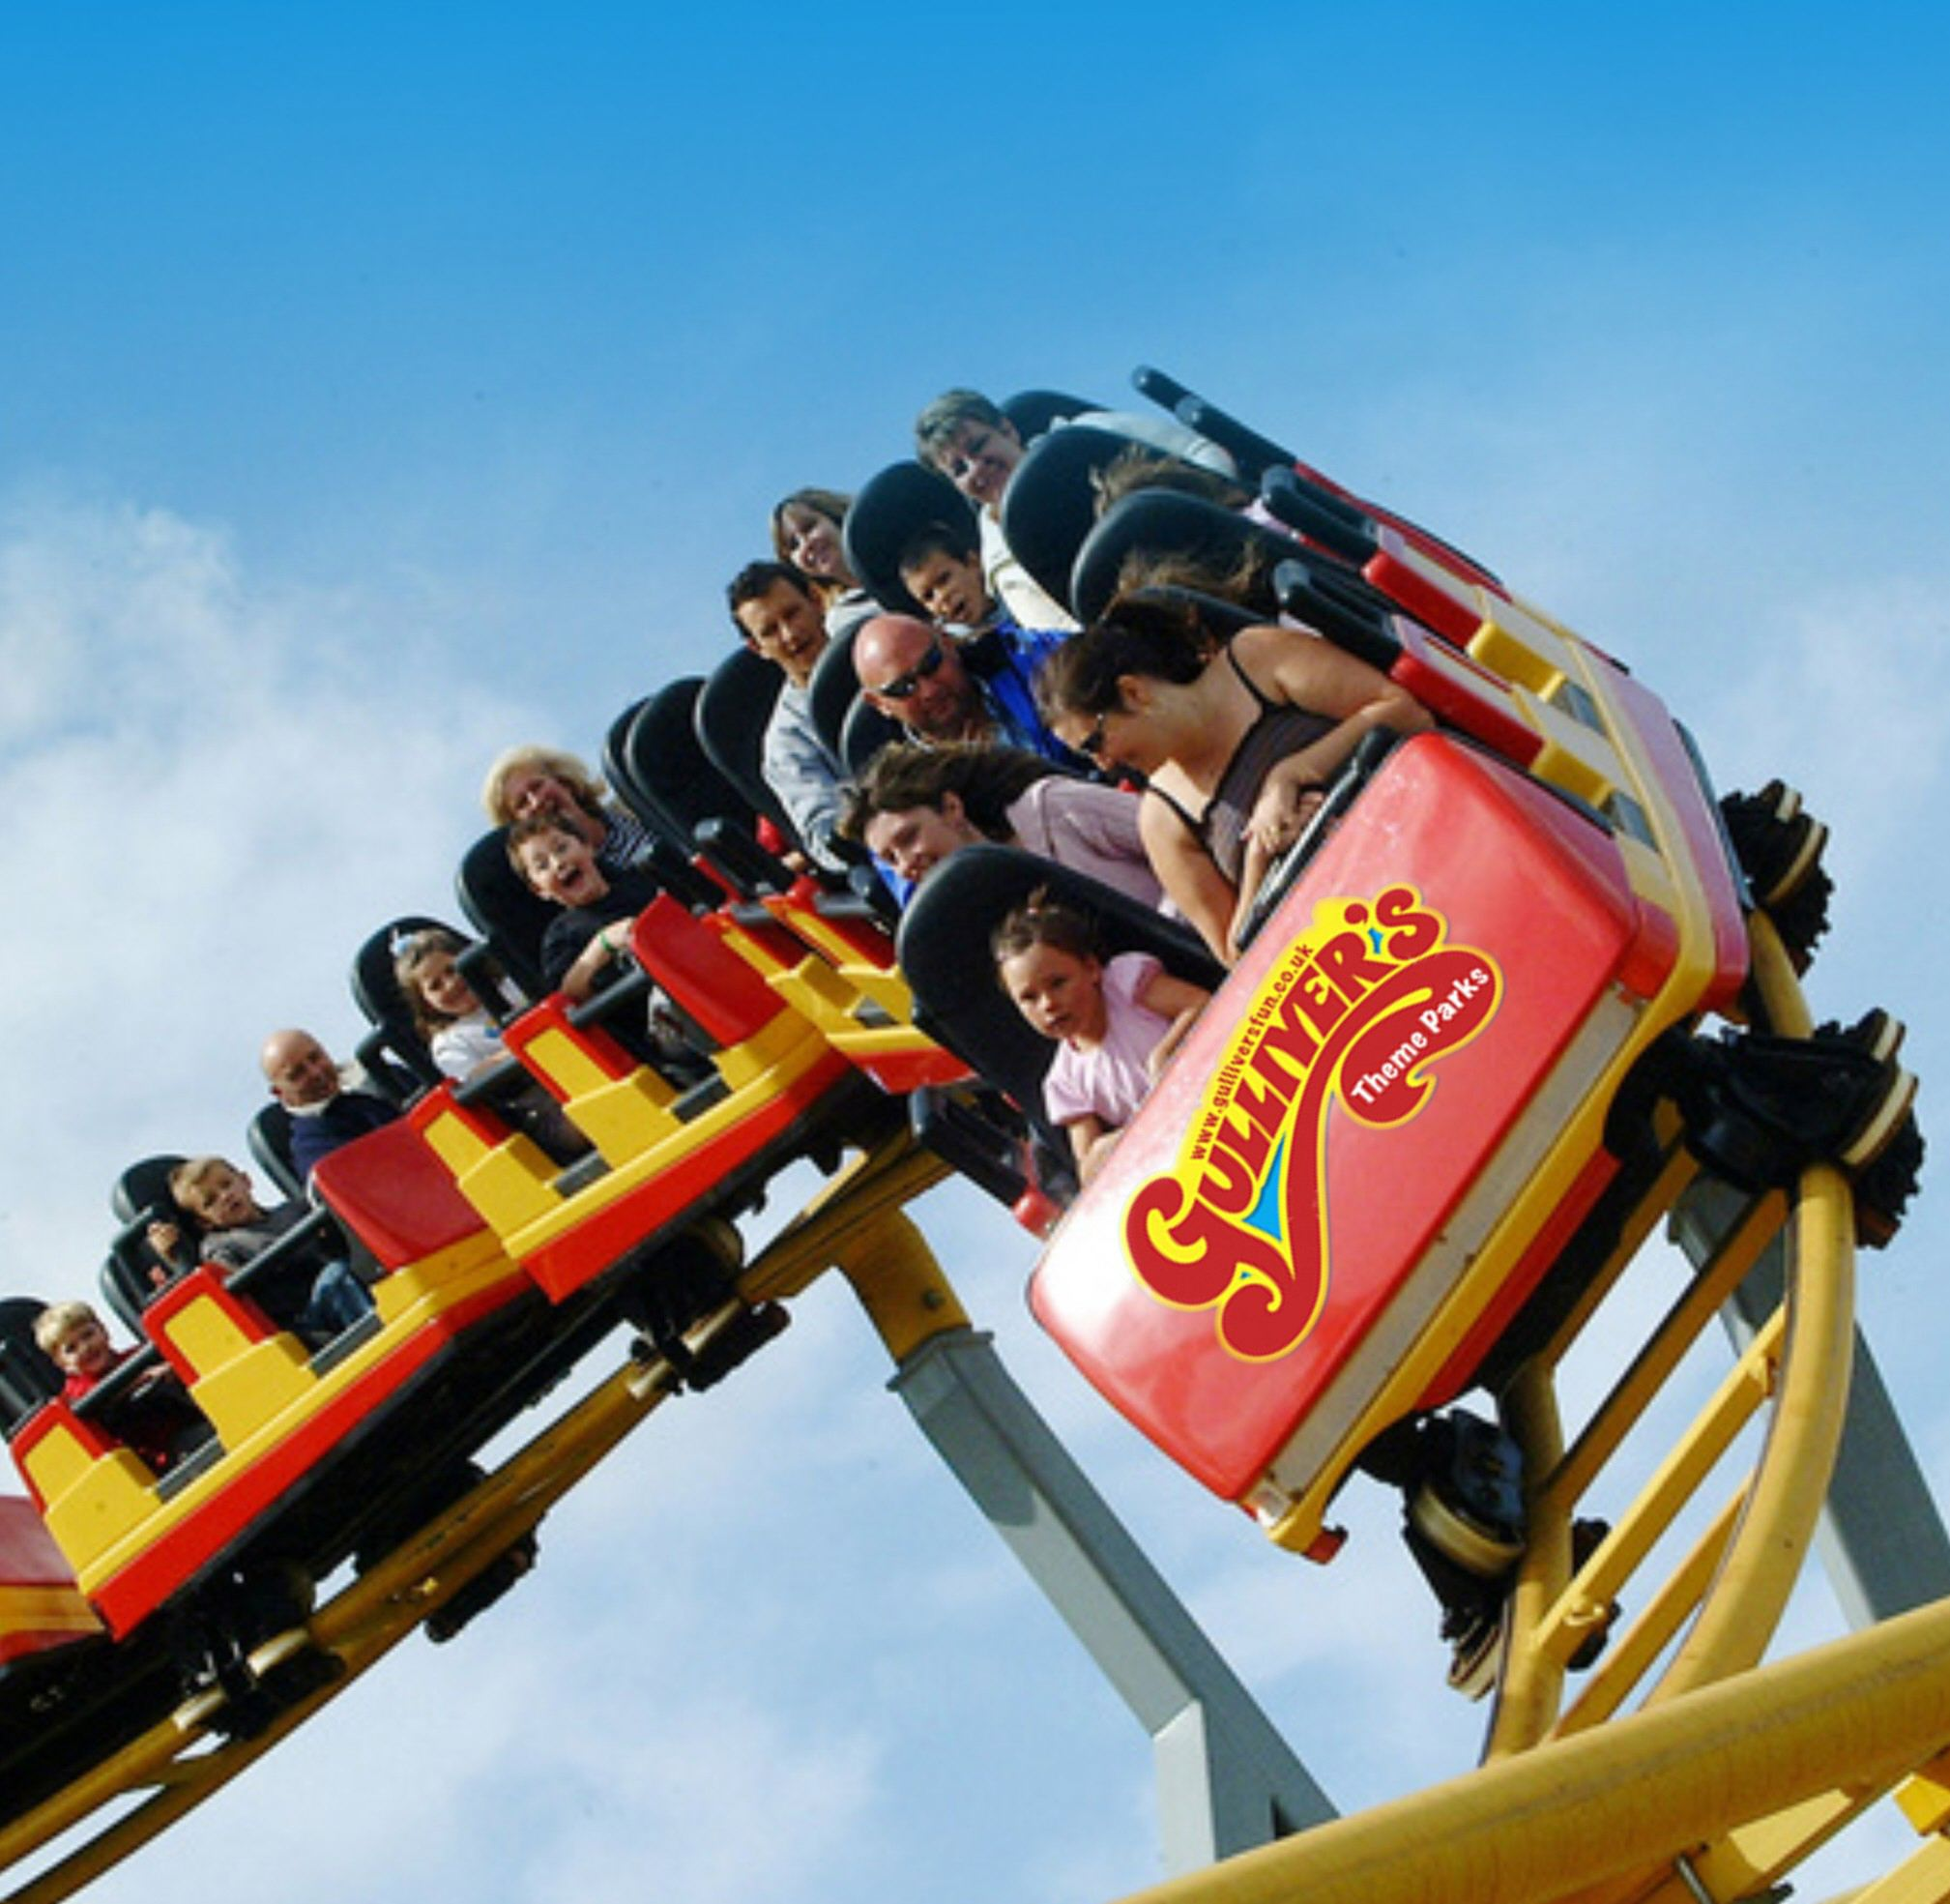 Gullivers Kingdom - Roller Coaster